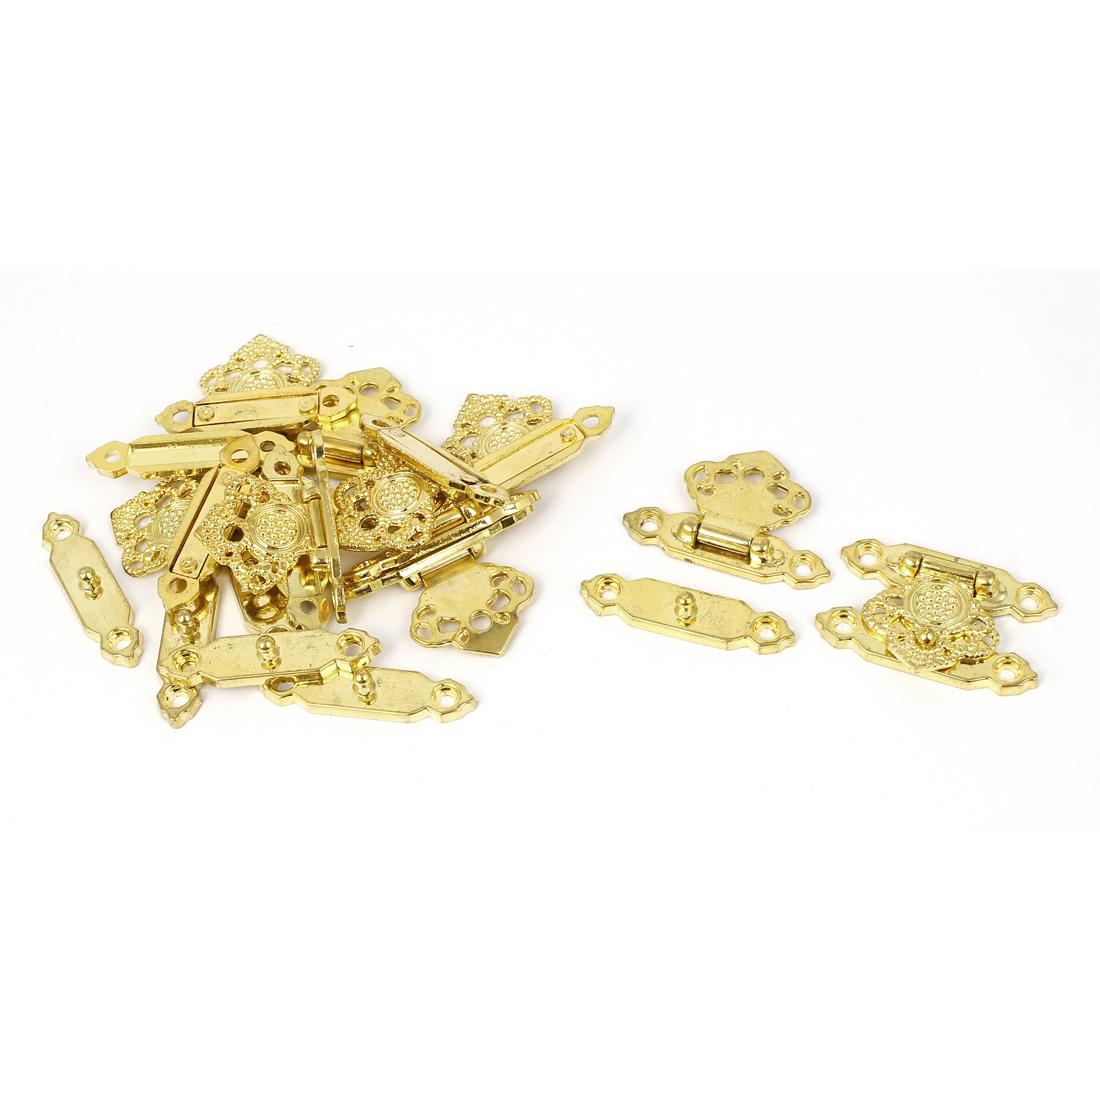 Metal Box Drawer Showcase Hasp Hook Lock Lid Latch Gold Tone 10pcs